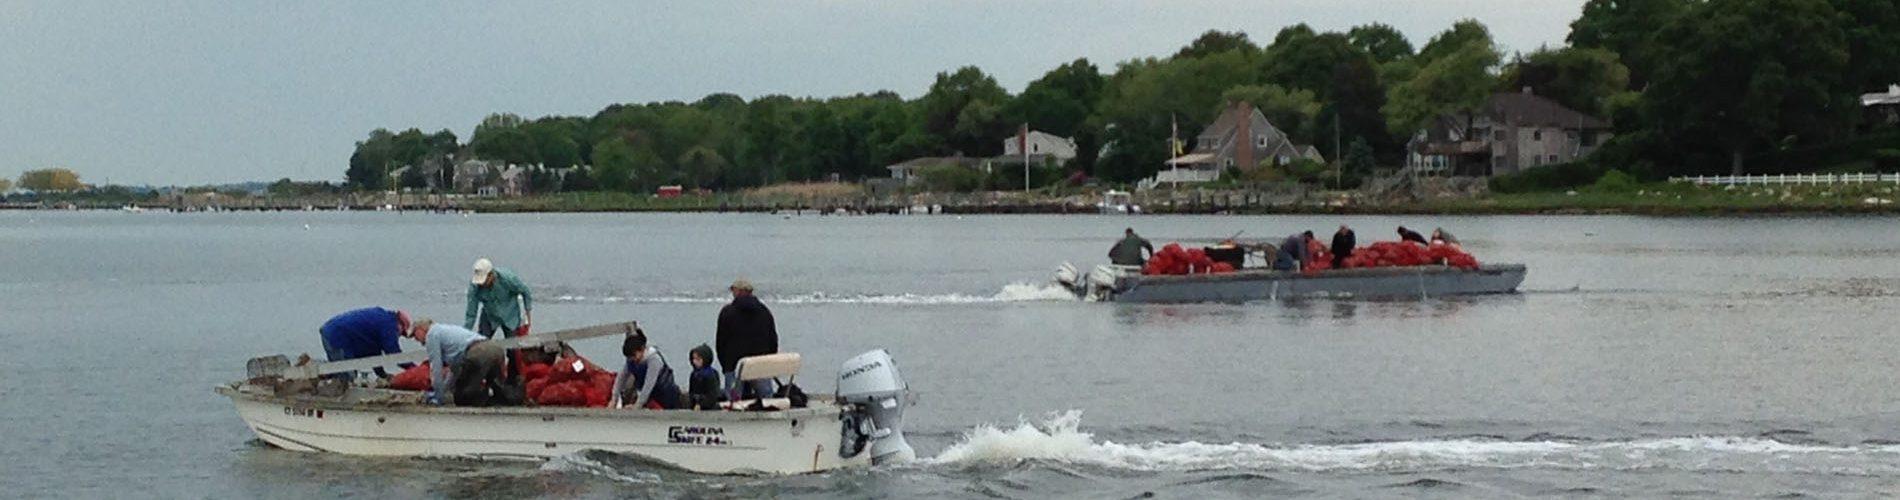 Boats seeding